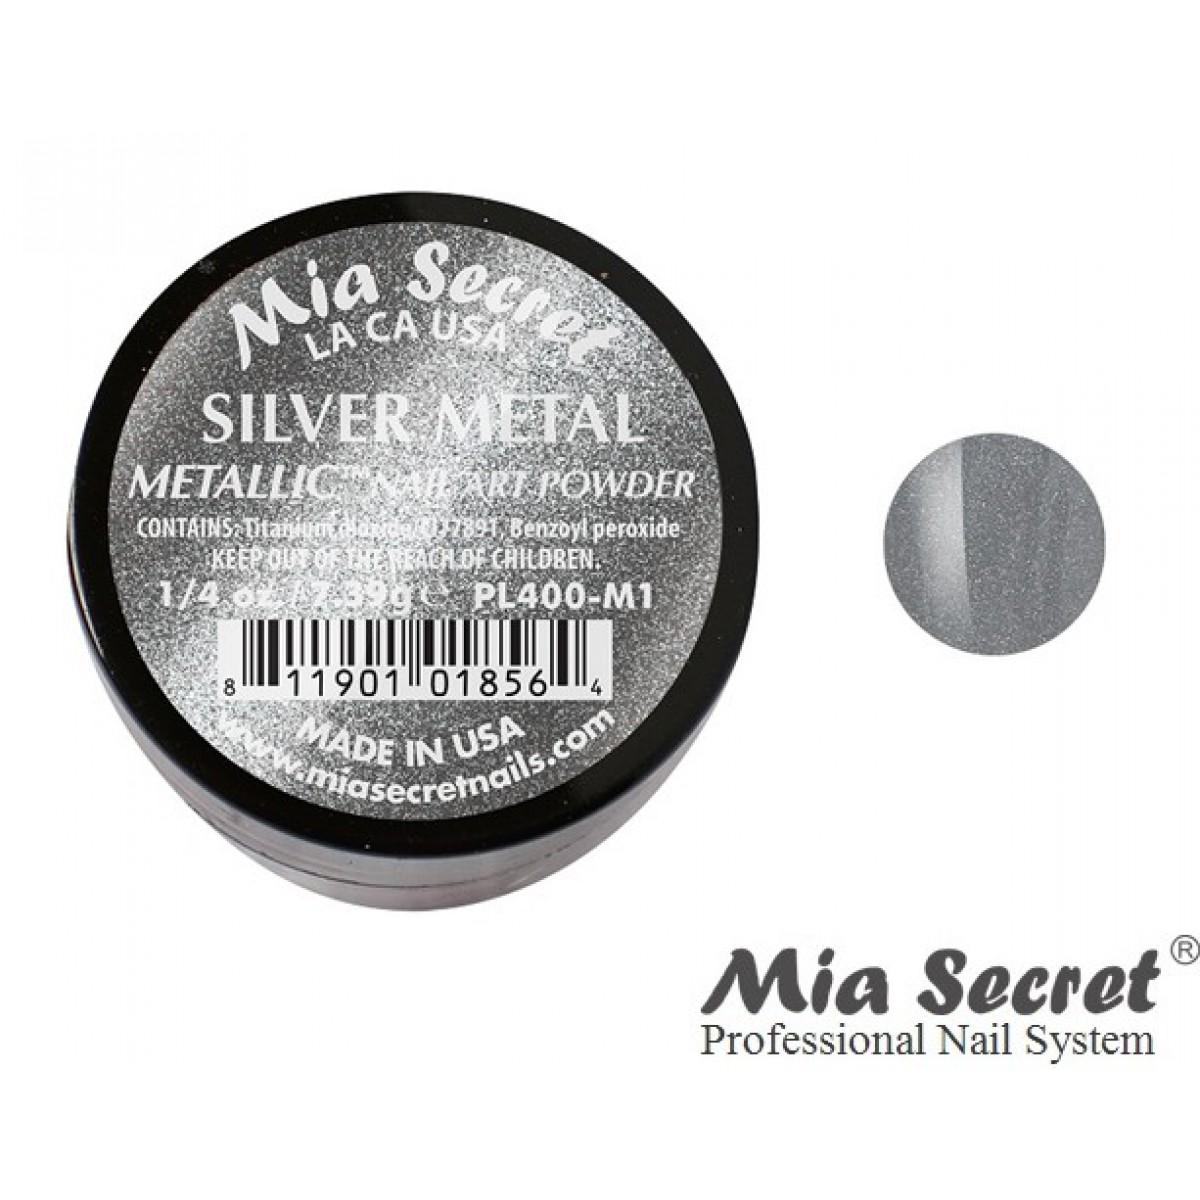 Metallic Acryl-Pulver Silver Metal